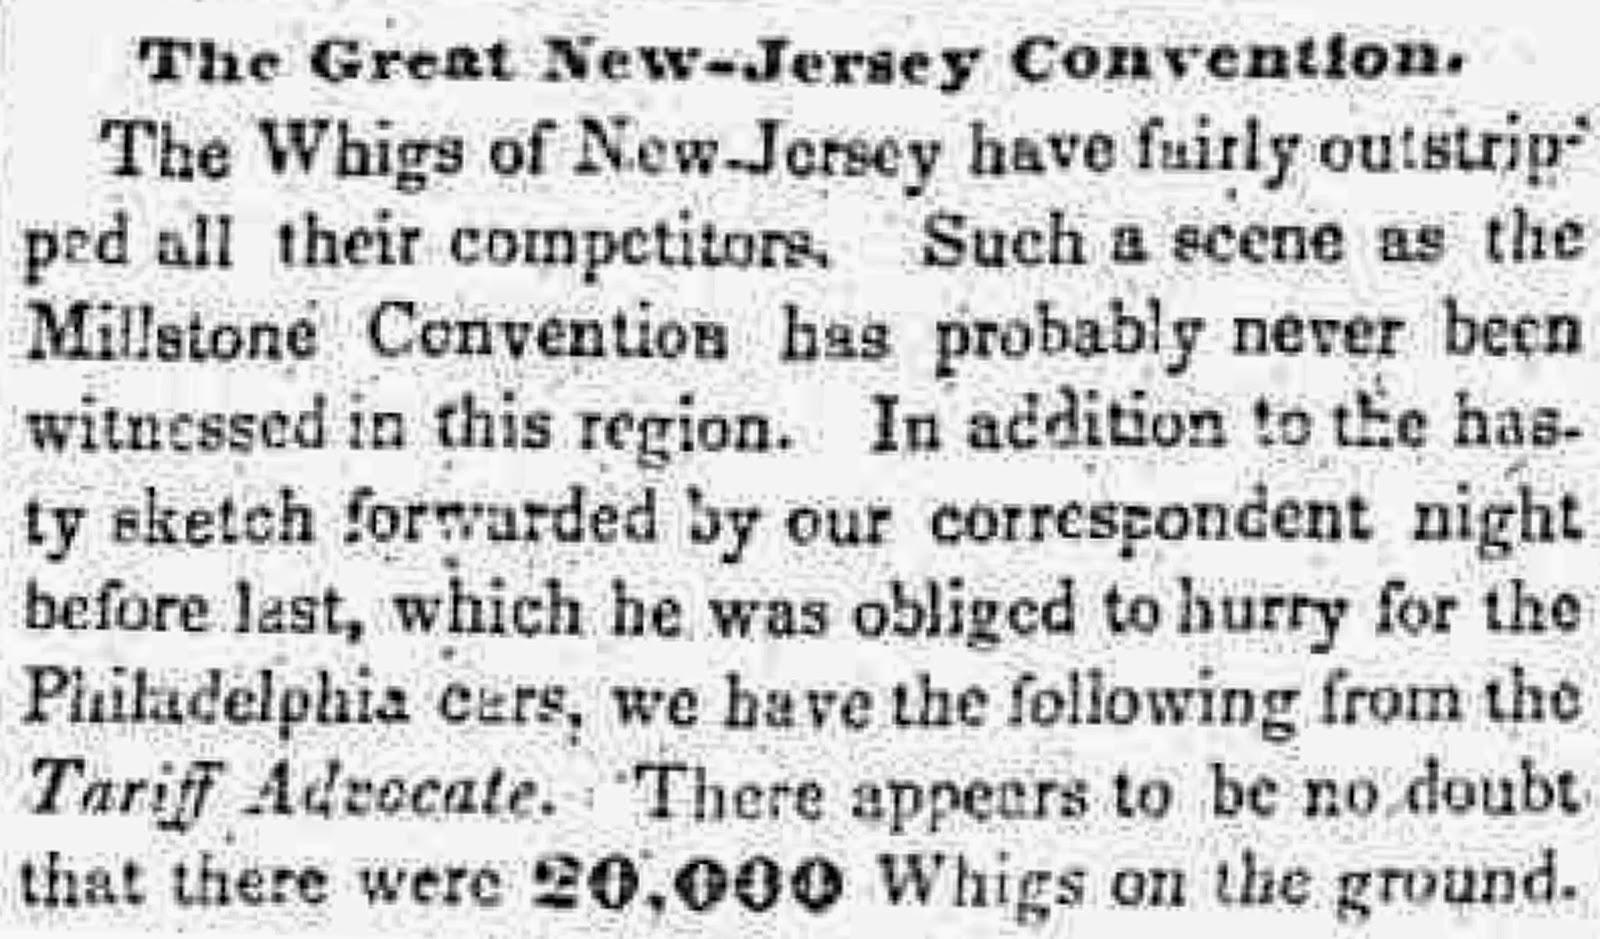 Alien face in box emoji meanings - New York Tribune August 9 1844